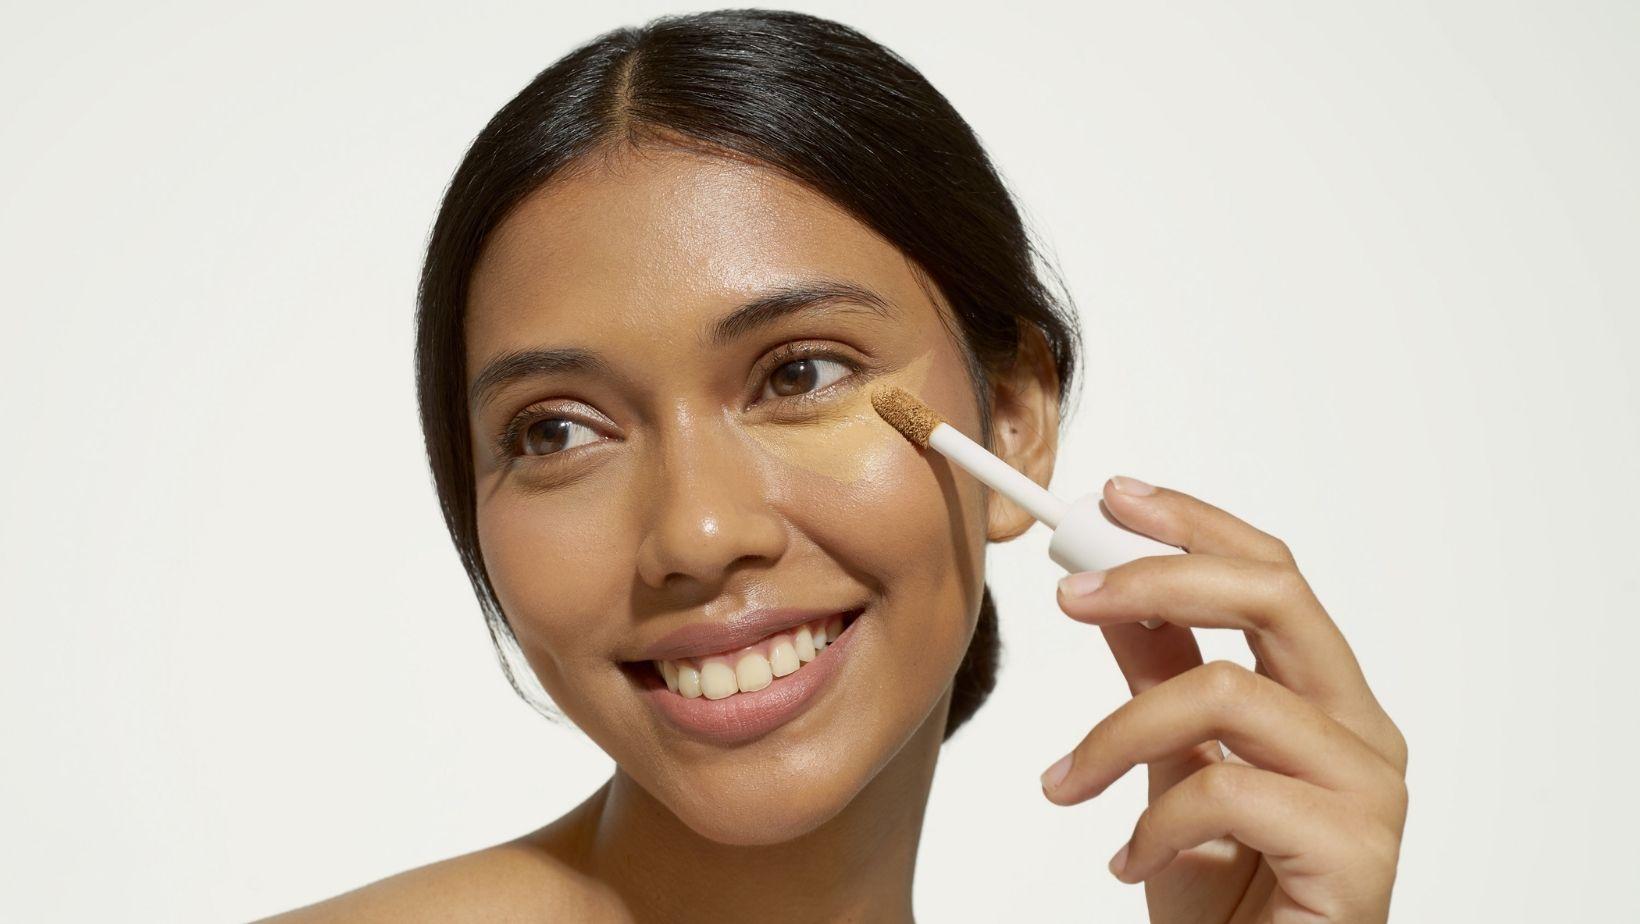 BLP Beauty Tambahkan Tiga Warna Dalam Lini Face Concealer